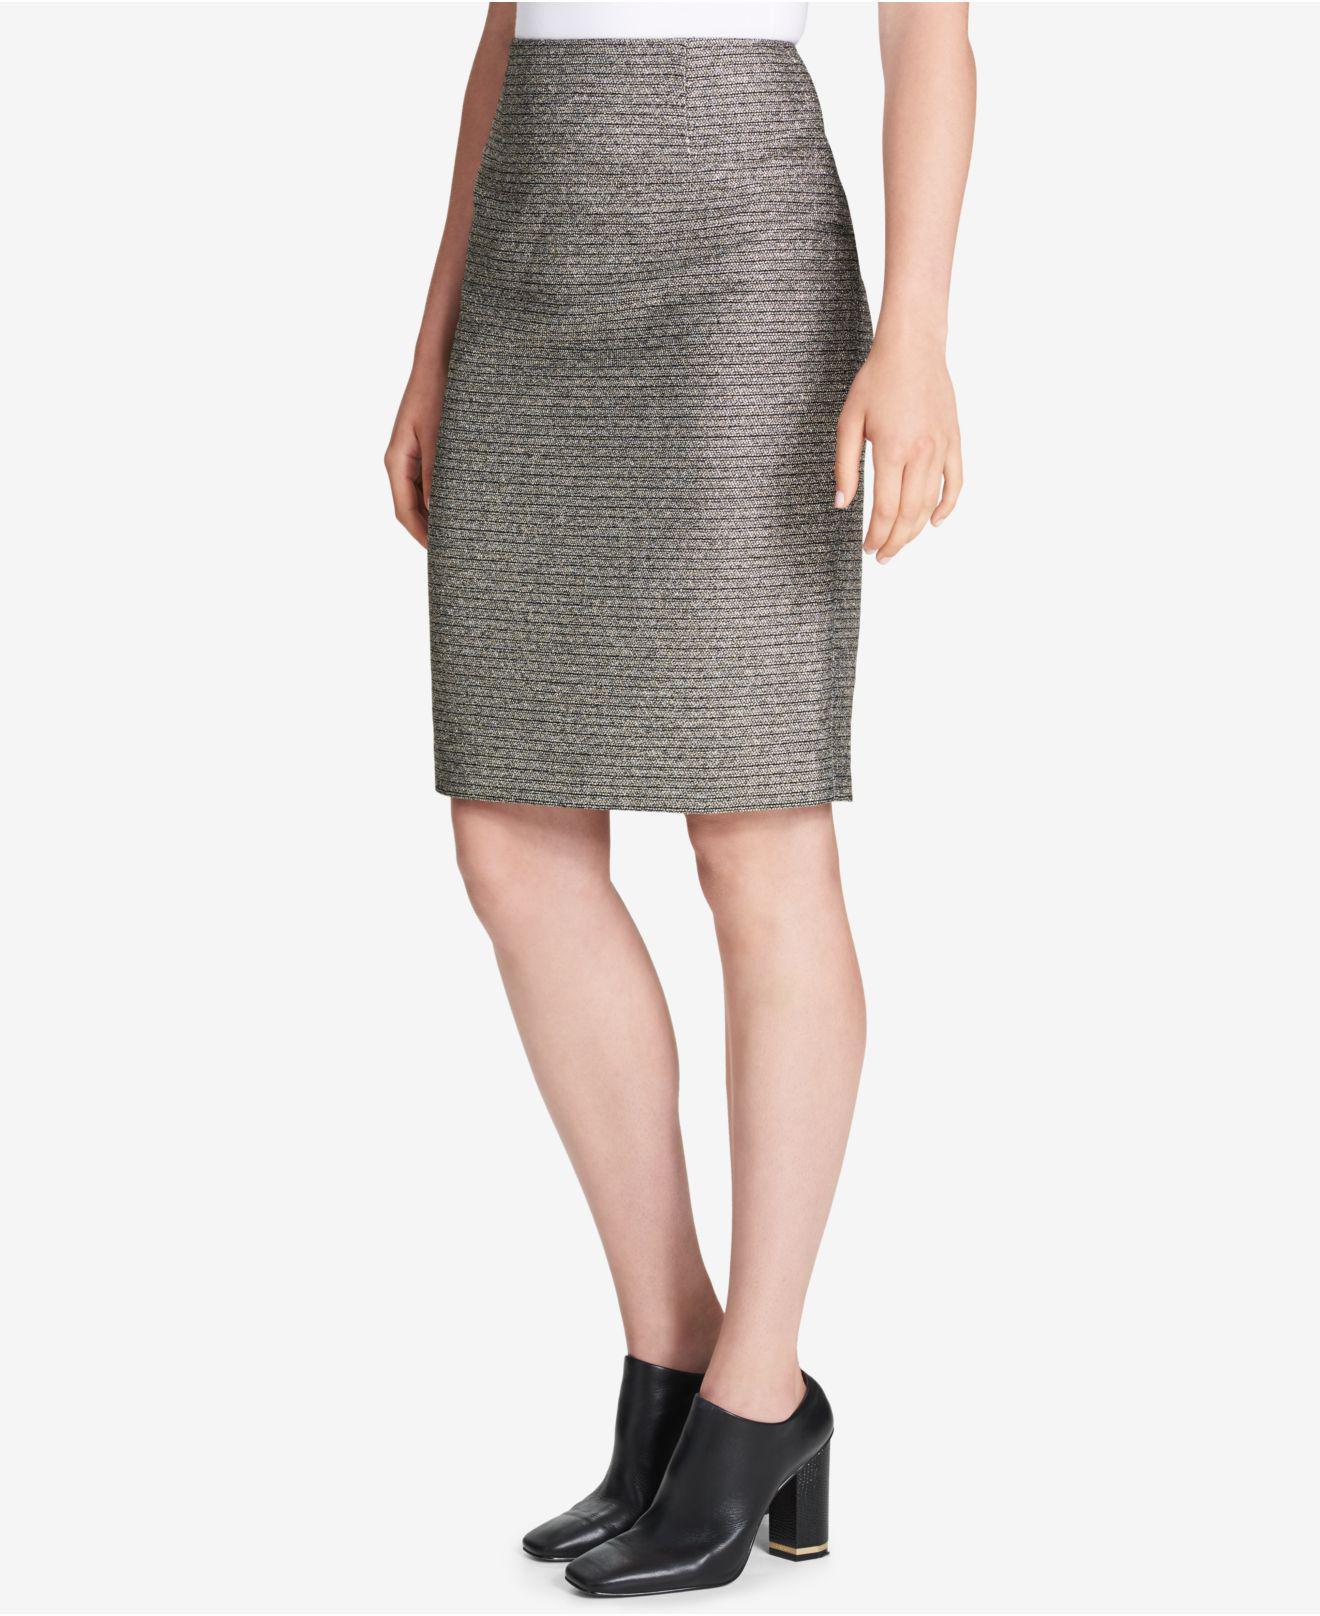 1adb02ccd9 Calvin Klein - Multicolor Metallic Bouclé Pencil Skirt - Lyst